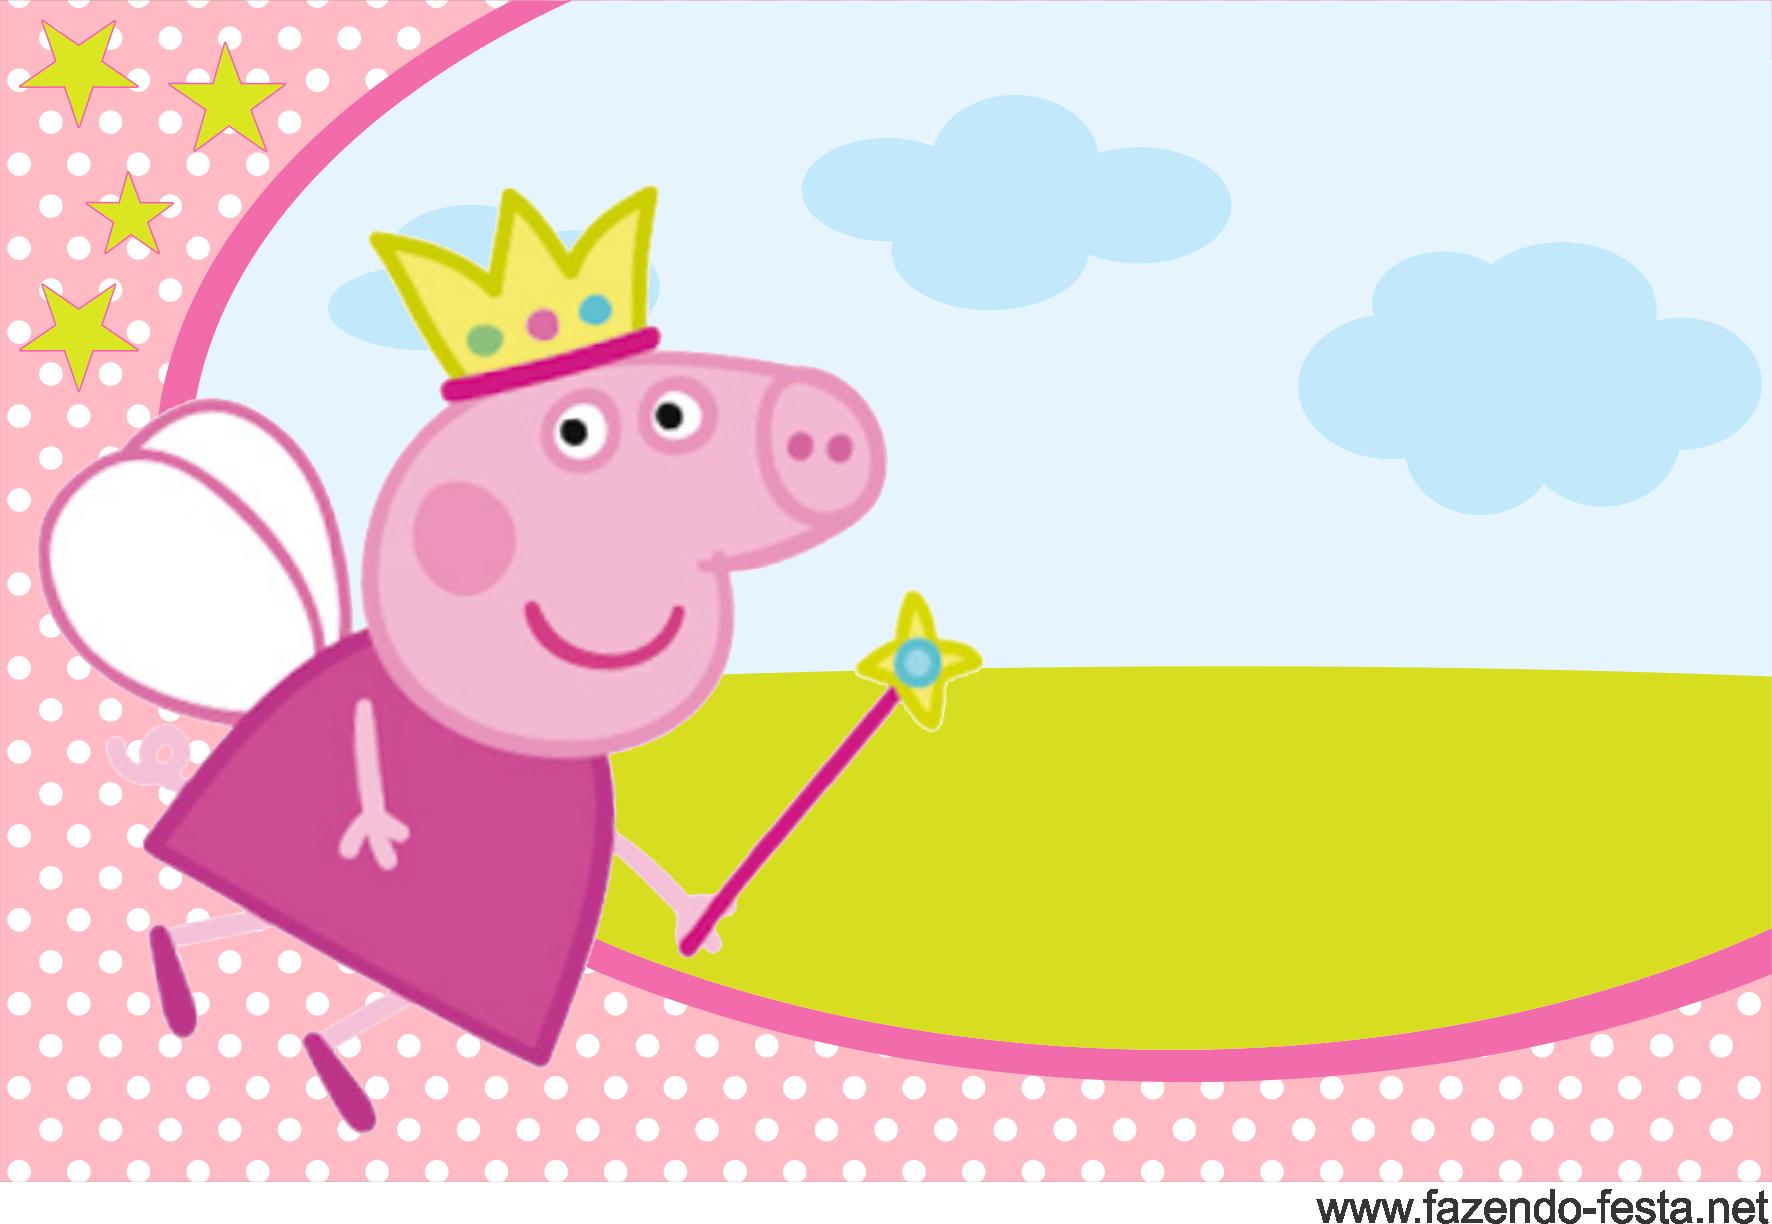 Fotos De Convite Aniversario Da Peppa CONVITE PEPPA PIG Prontos Para  Imprimir